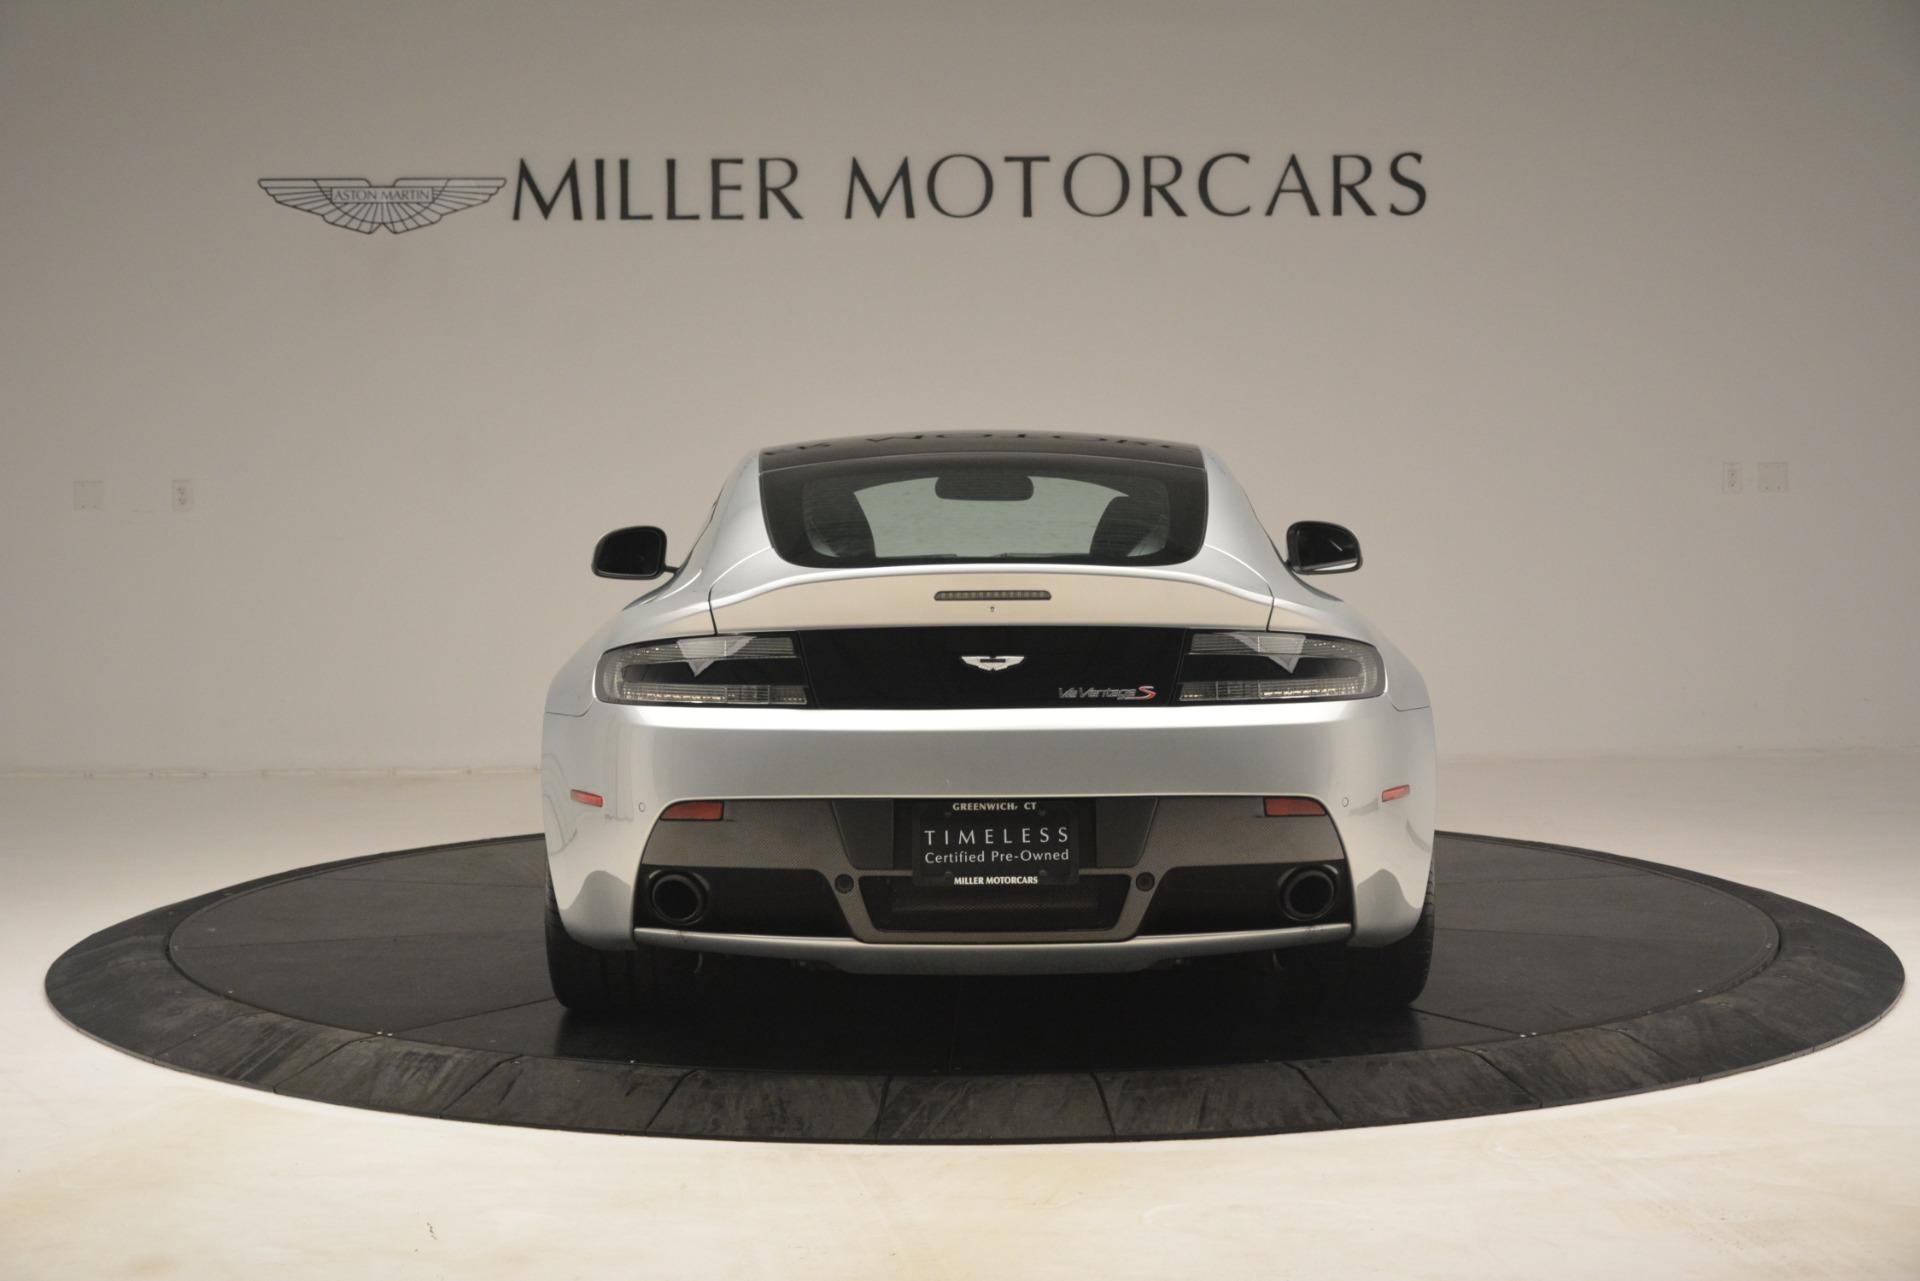 Used 2015 Aston Martin V12 Vantage S Coupe For Sale In Greenwich, CT. Alfa Romeo of Greenwich, 7577 3206_p6